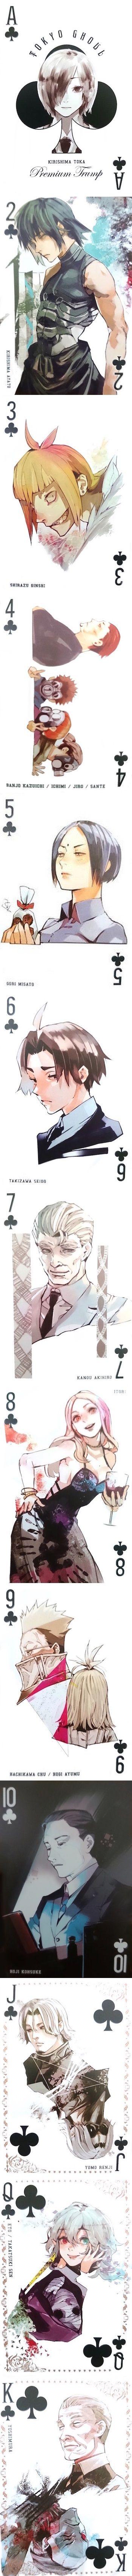 Tokyo Ghoul    Ishida Sui    Trump Cards    Clubs Suit